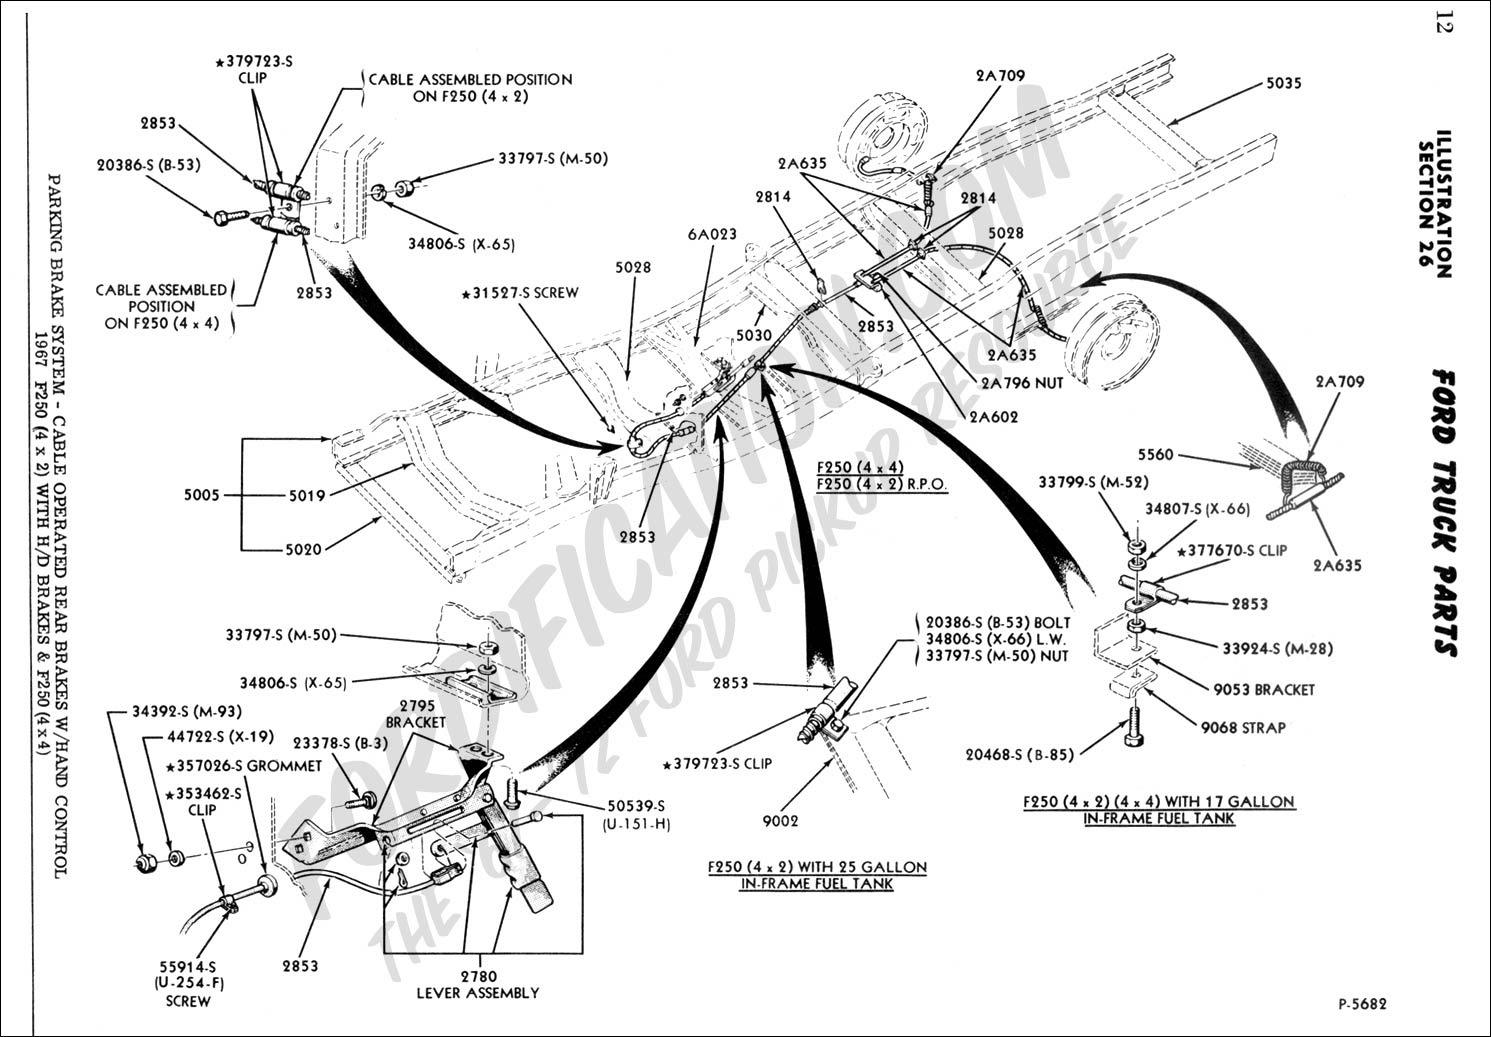 Wiring Diagram: 29 1997 Ford F350 Rear Brake Diagram